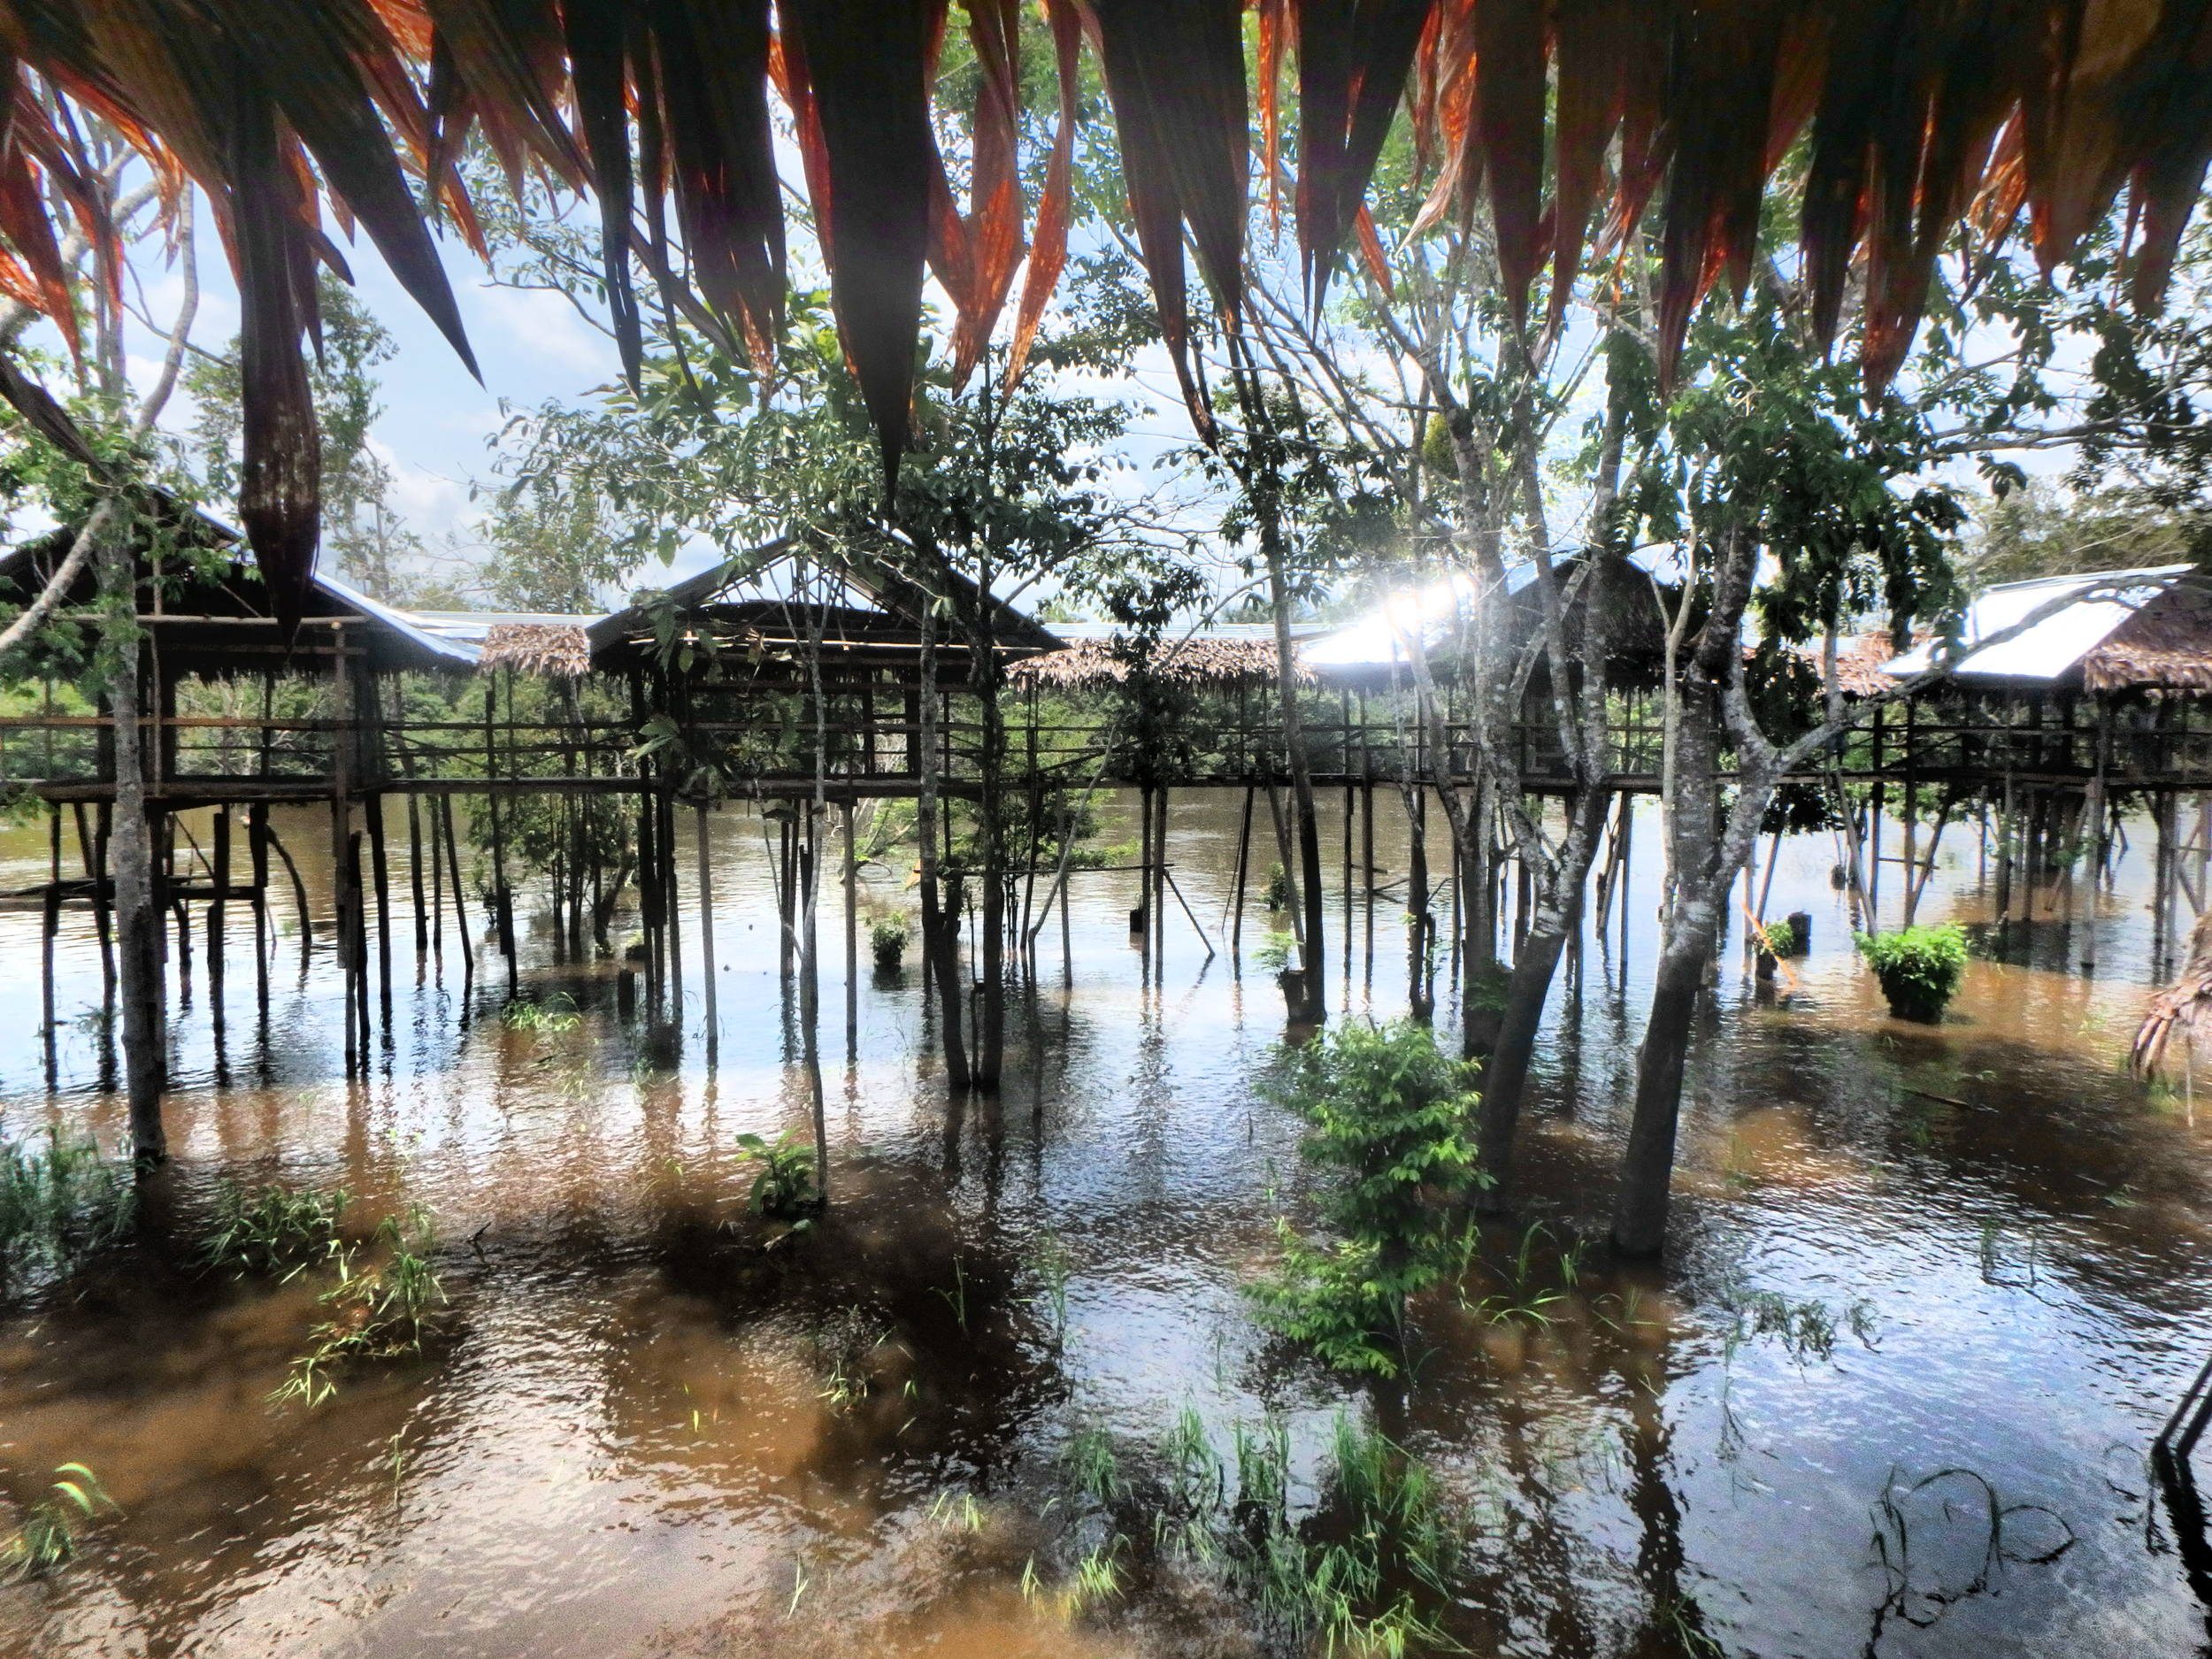 Peru_Iquitos_Amazon 3.JPG